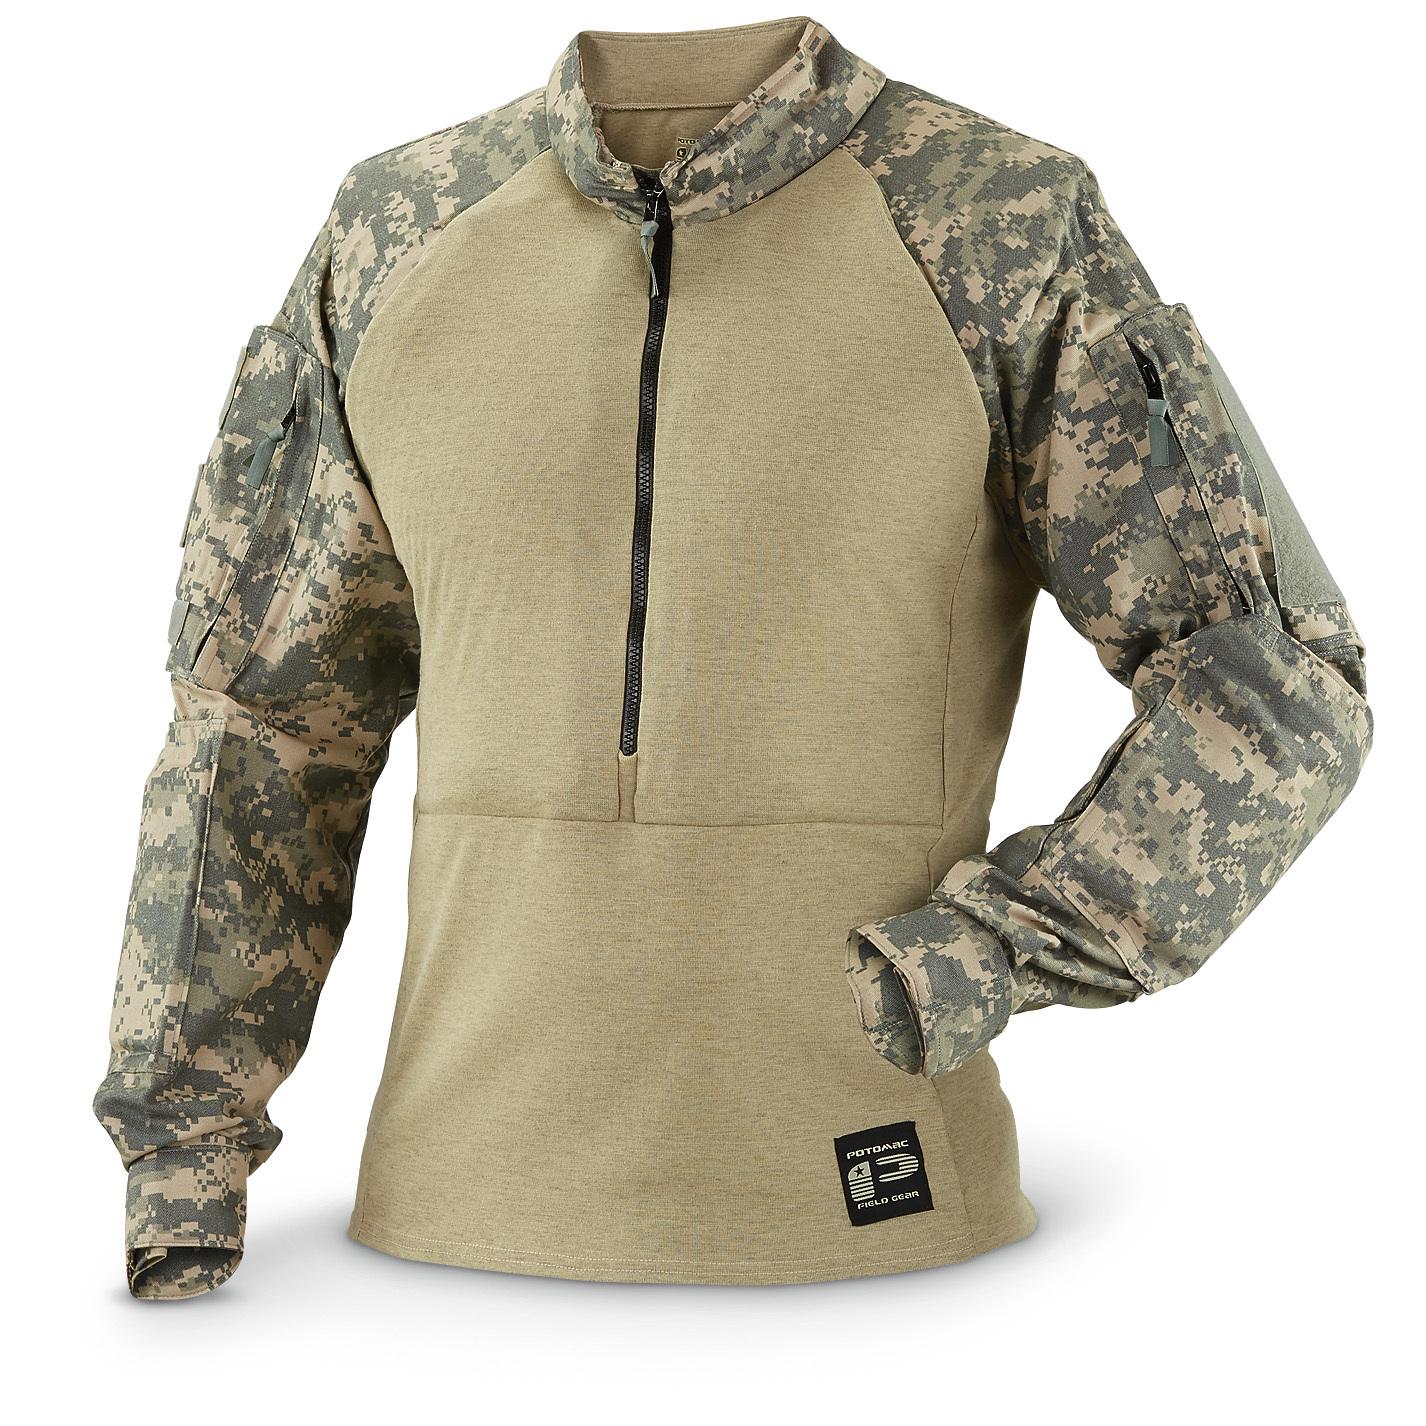 Under Armour Ski Jackets